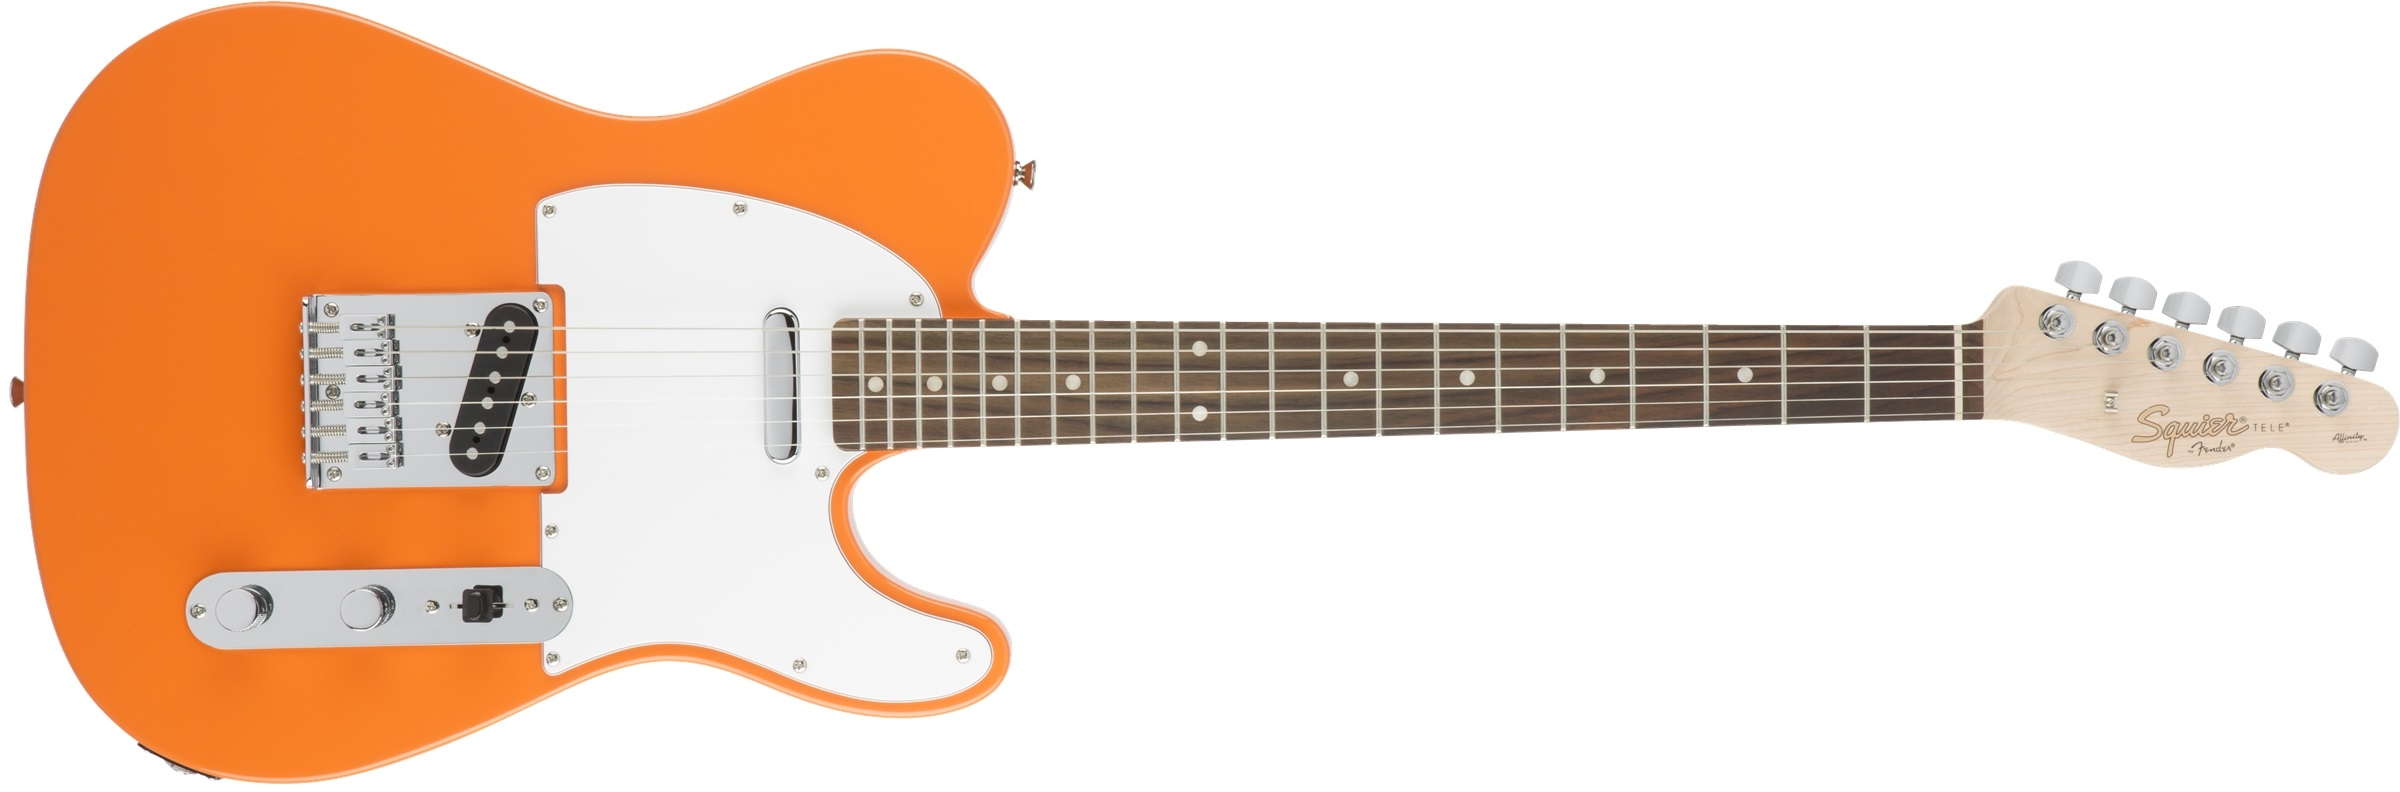 Fender Squier Affinity Telecaster CPO RW